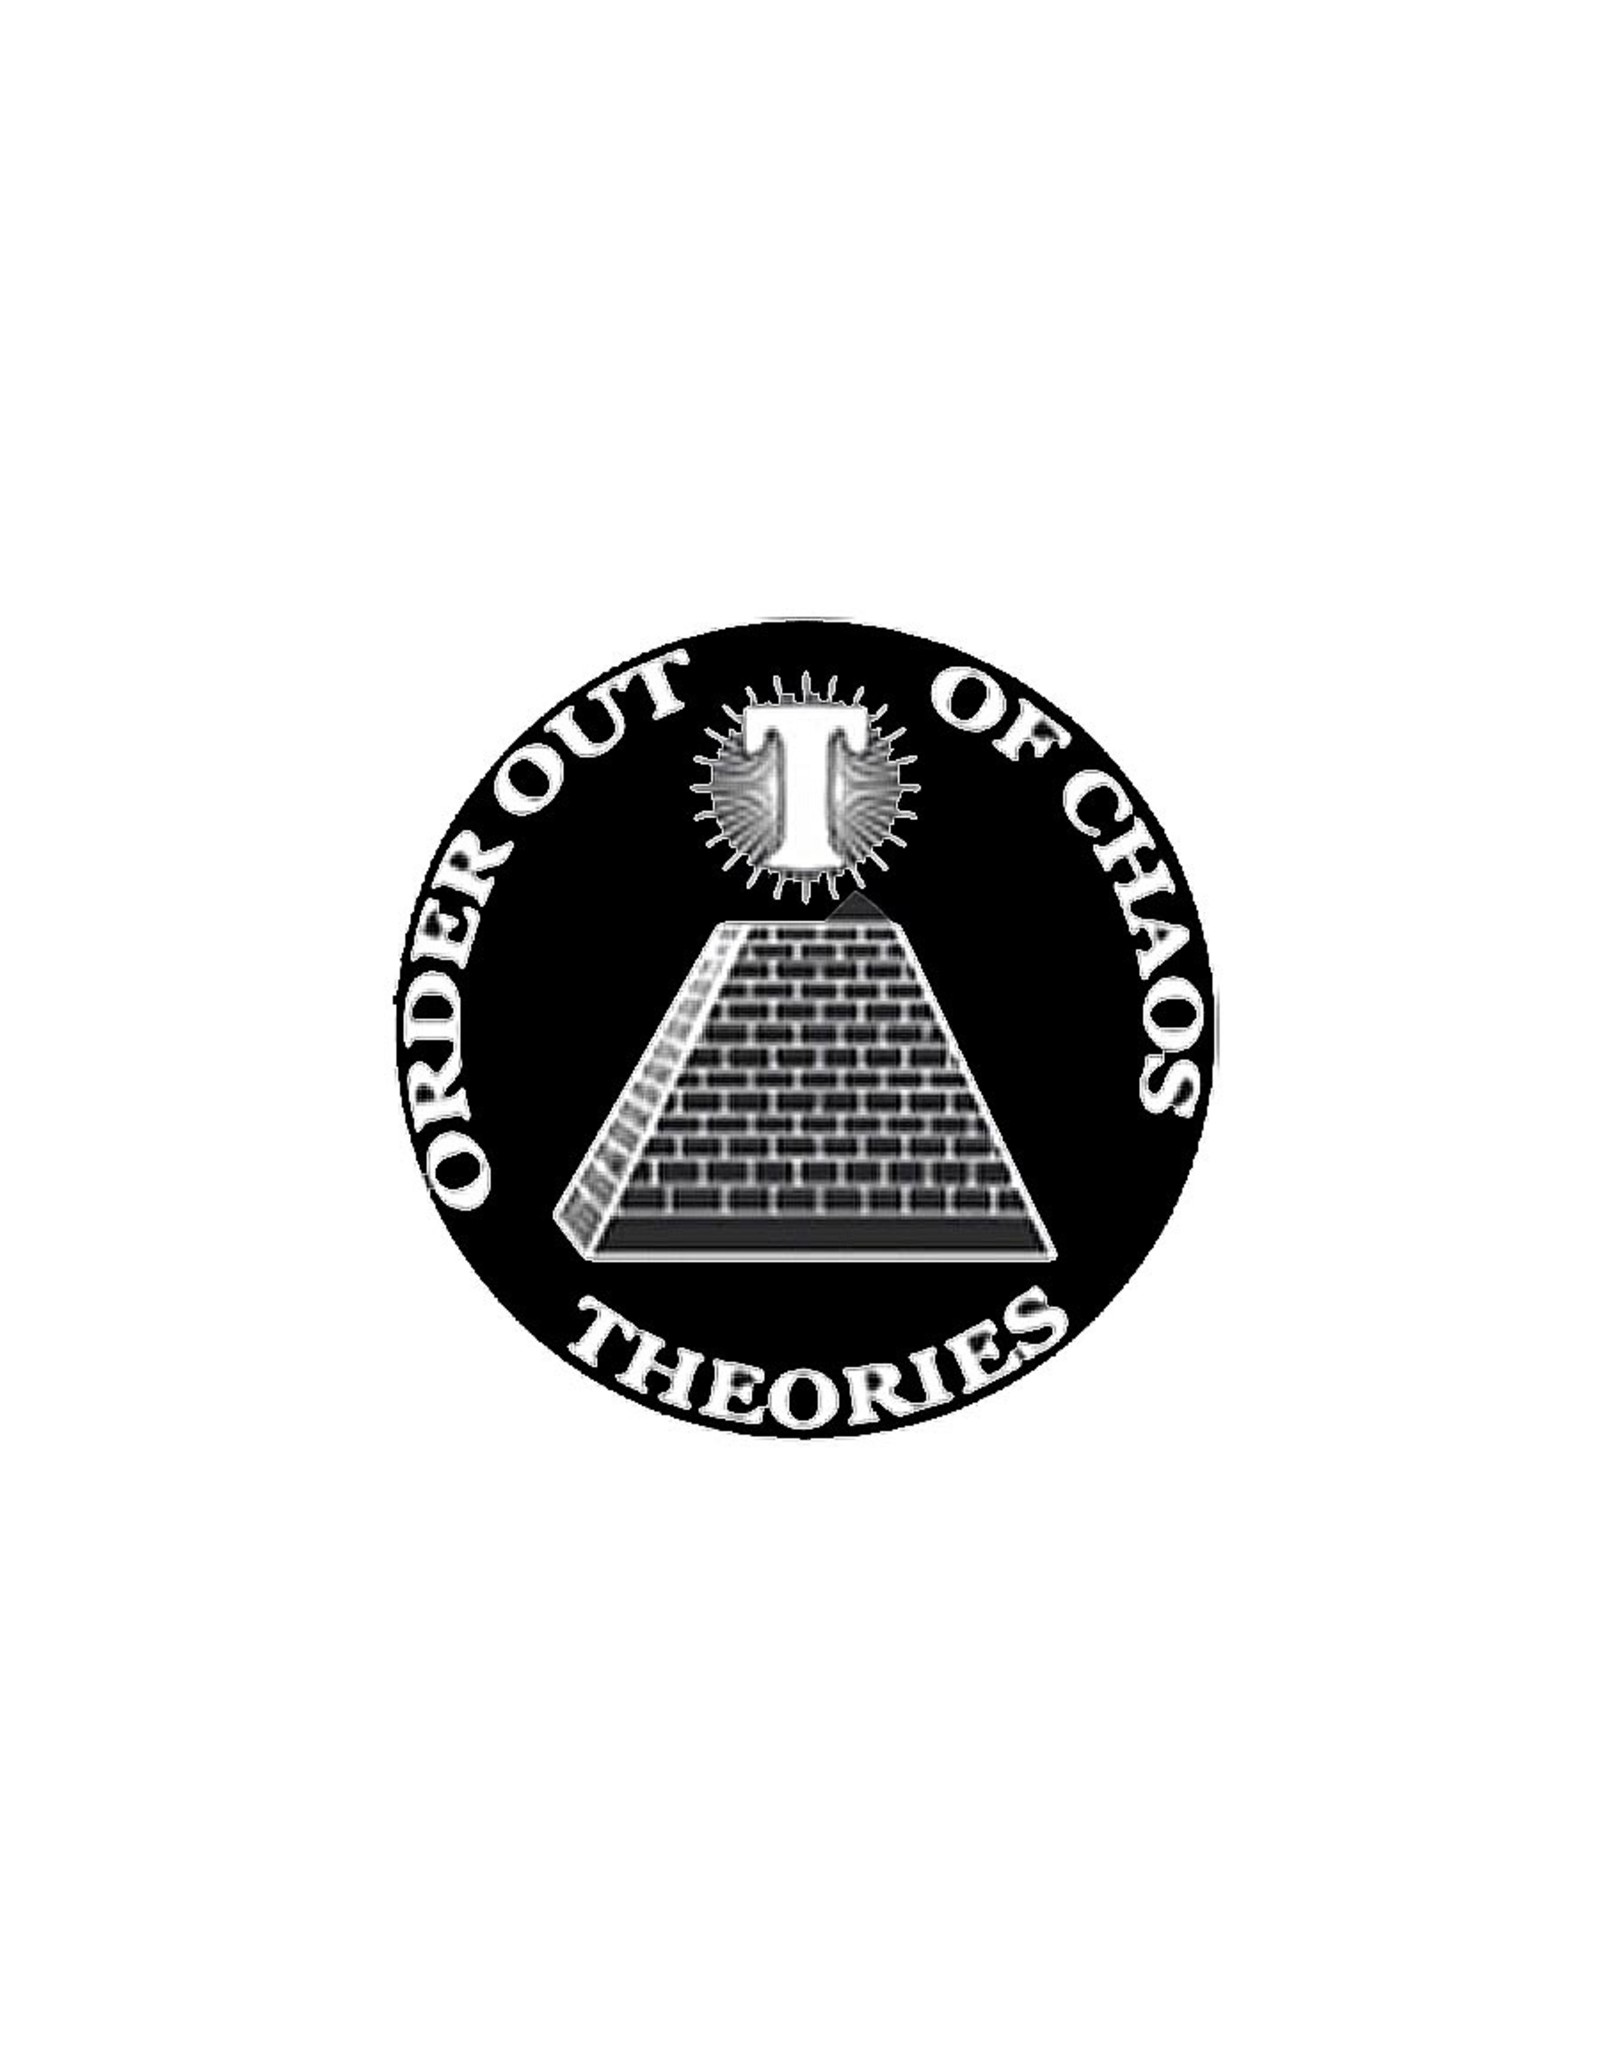 Theories Of Atlantis Theories Sticker Chaos (Black/White)